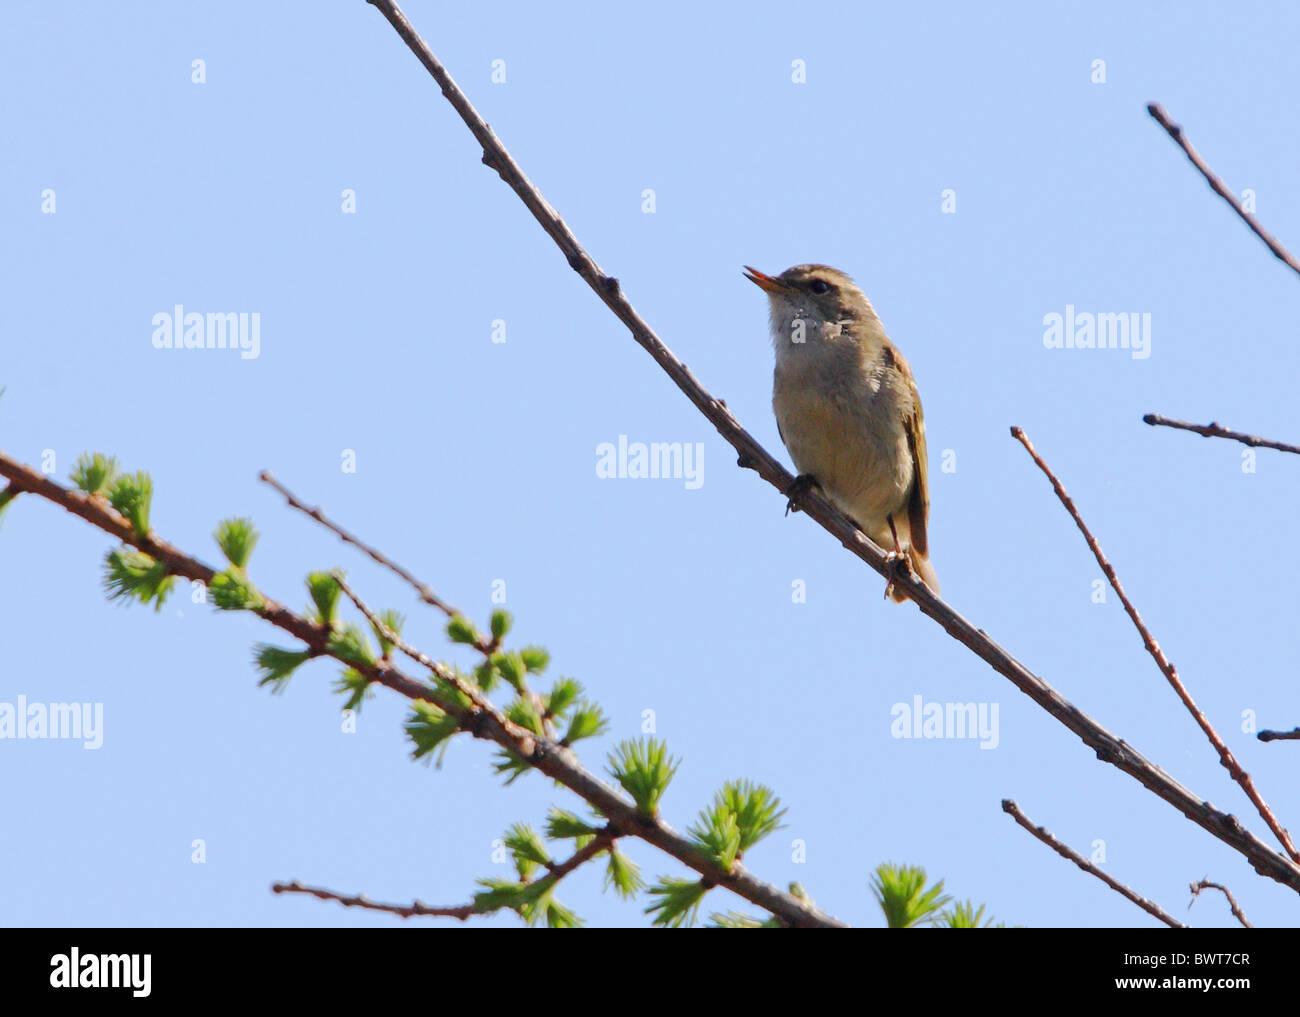 bird birds animal animals warbler warblers asia asian china chinese endemic wildlife nature passerine passerines Stock Photo